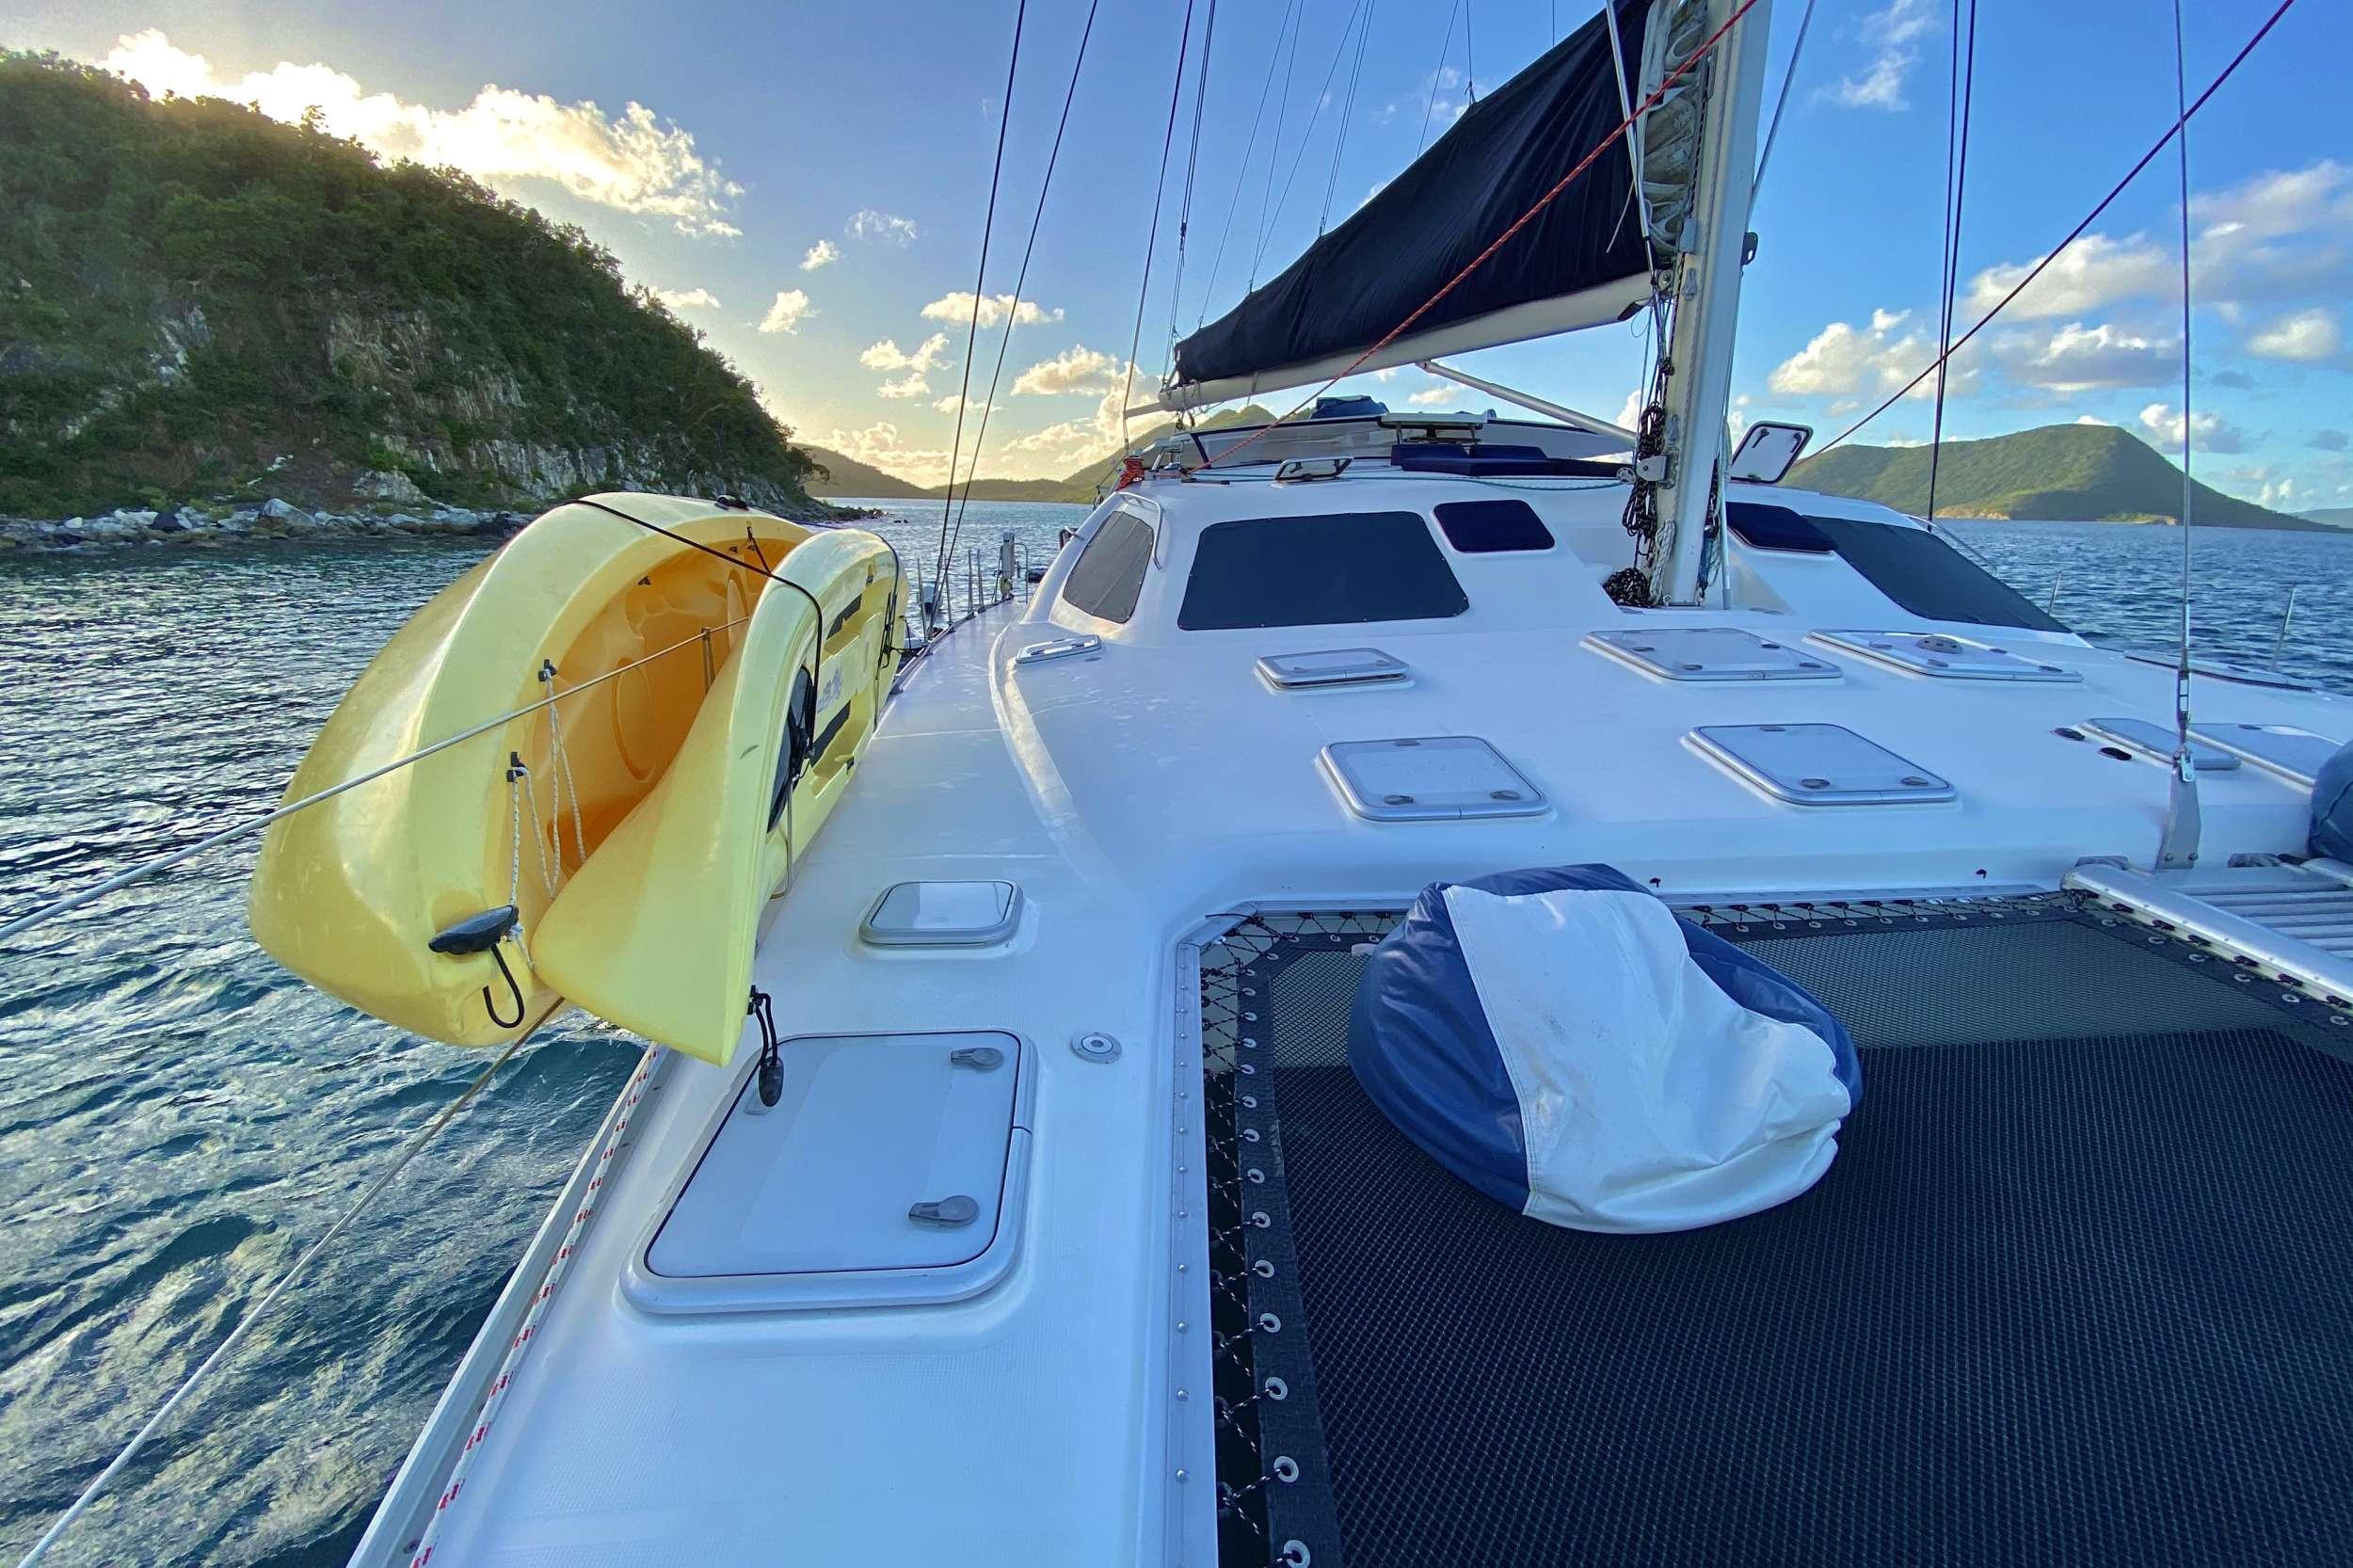 Guests enjoying a day of sailing